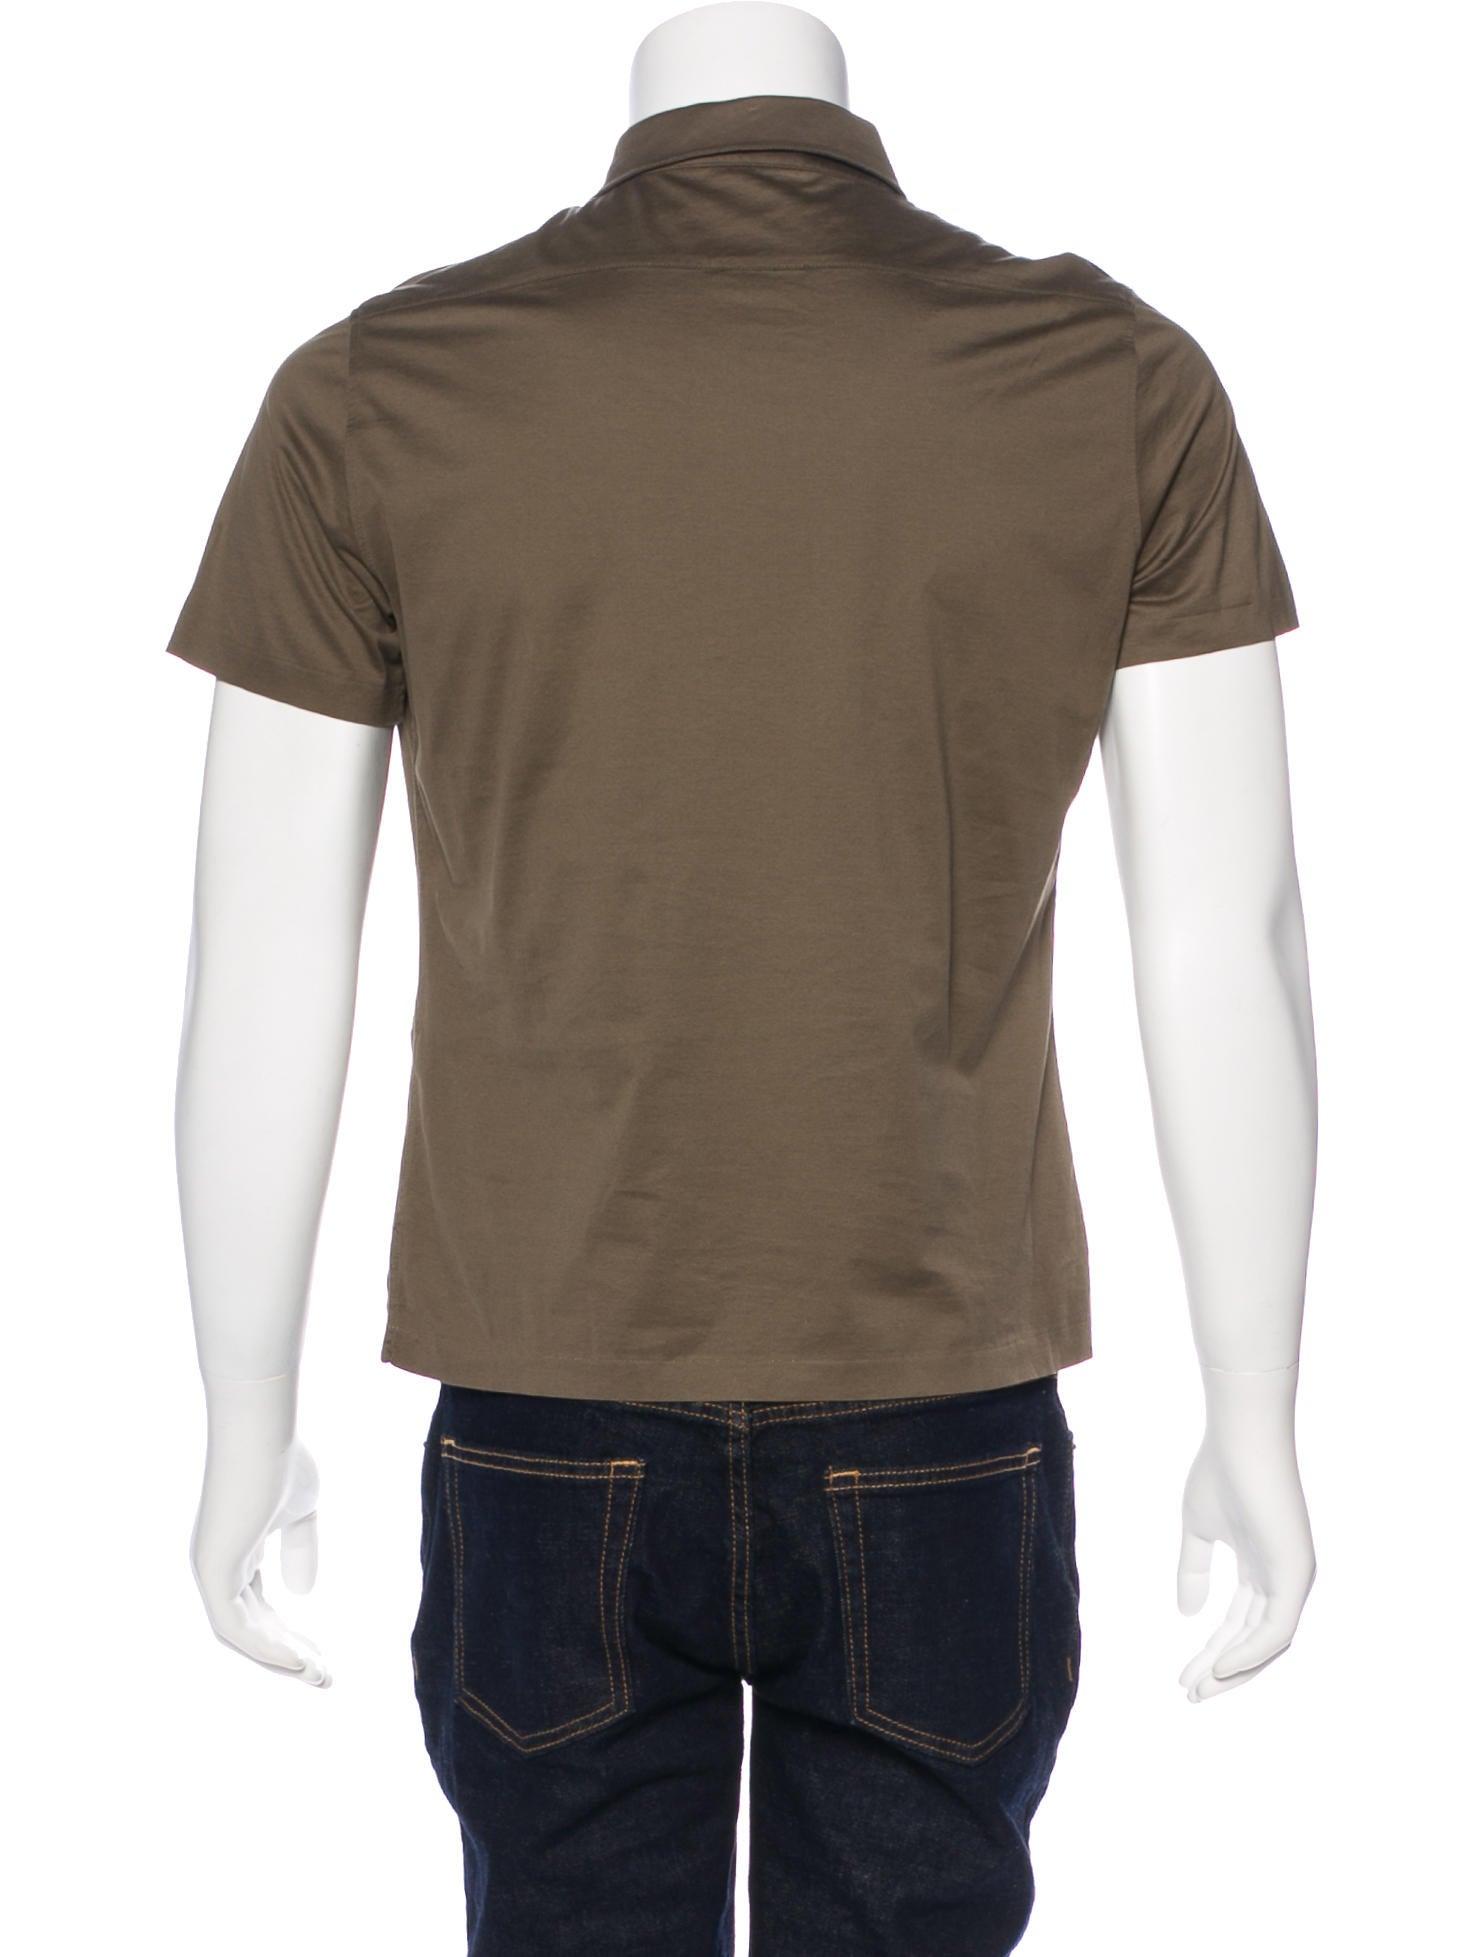 Ralph lauren black label knit polo shirt clothing for Ralph lauren black label polo shirt